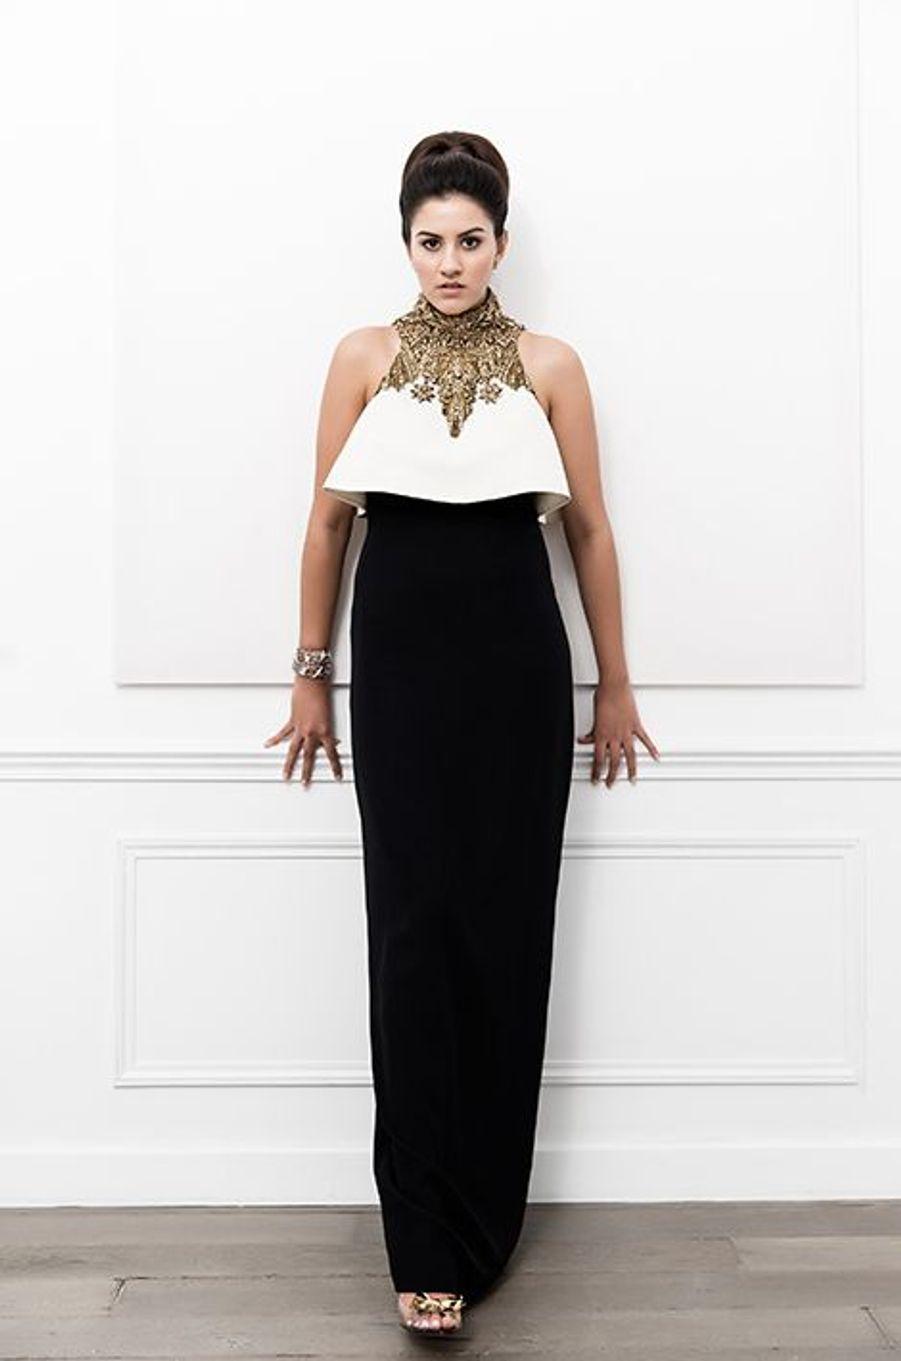 Zara Fistolera (Népal) en robe Alexander McQueen, bijoux Payal New York